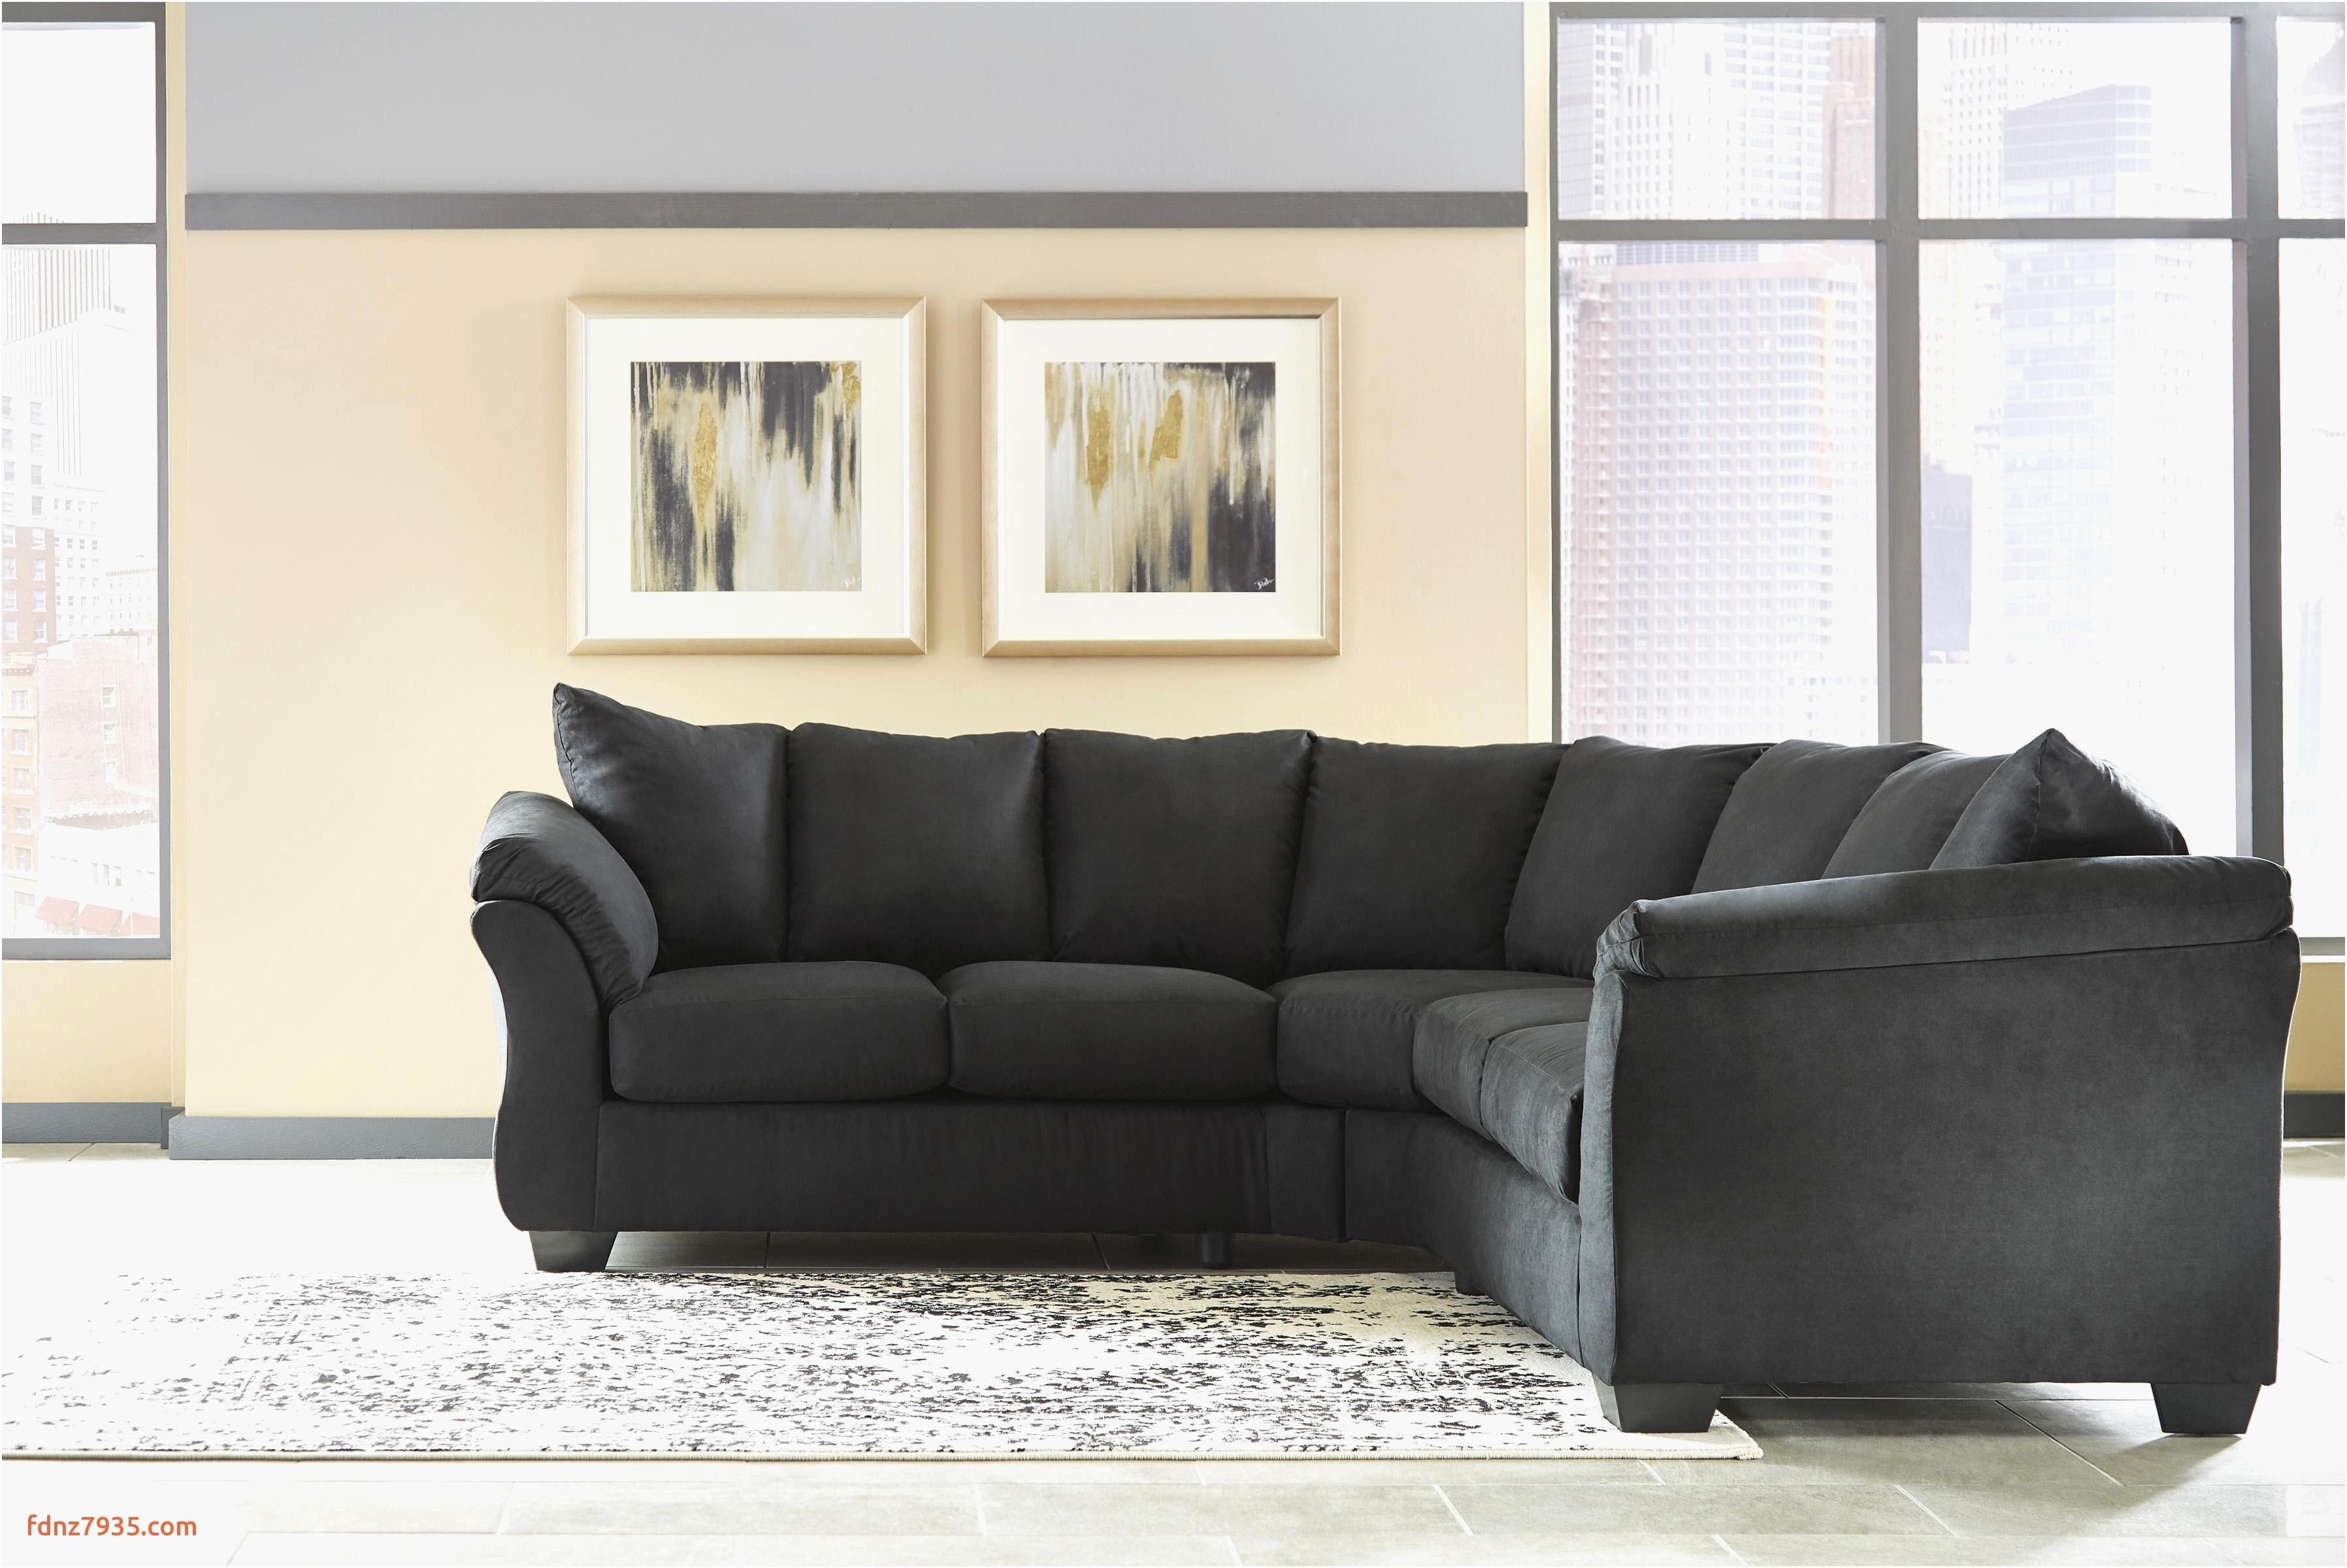 ashley furniture queen sleeper sofa new home design ashley furniture futon unique memory foam sleeper sofa